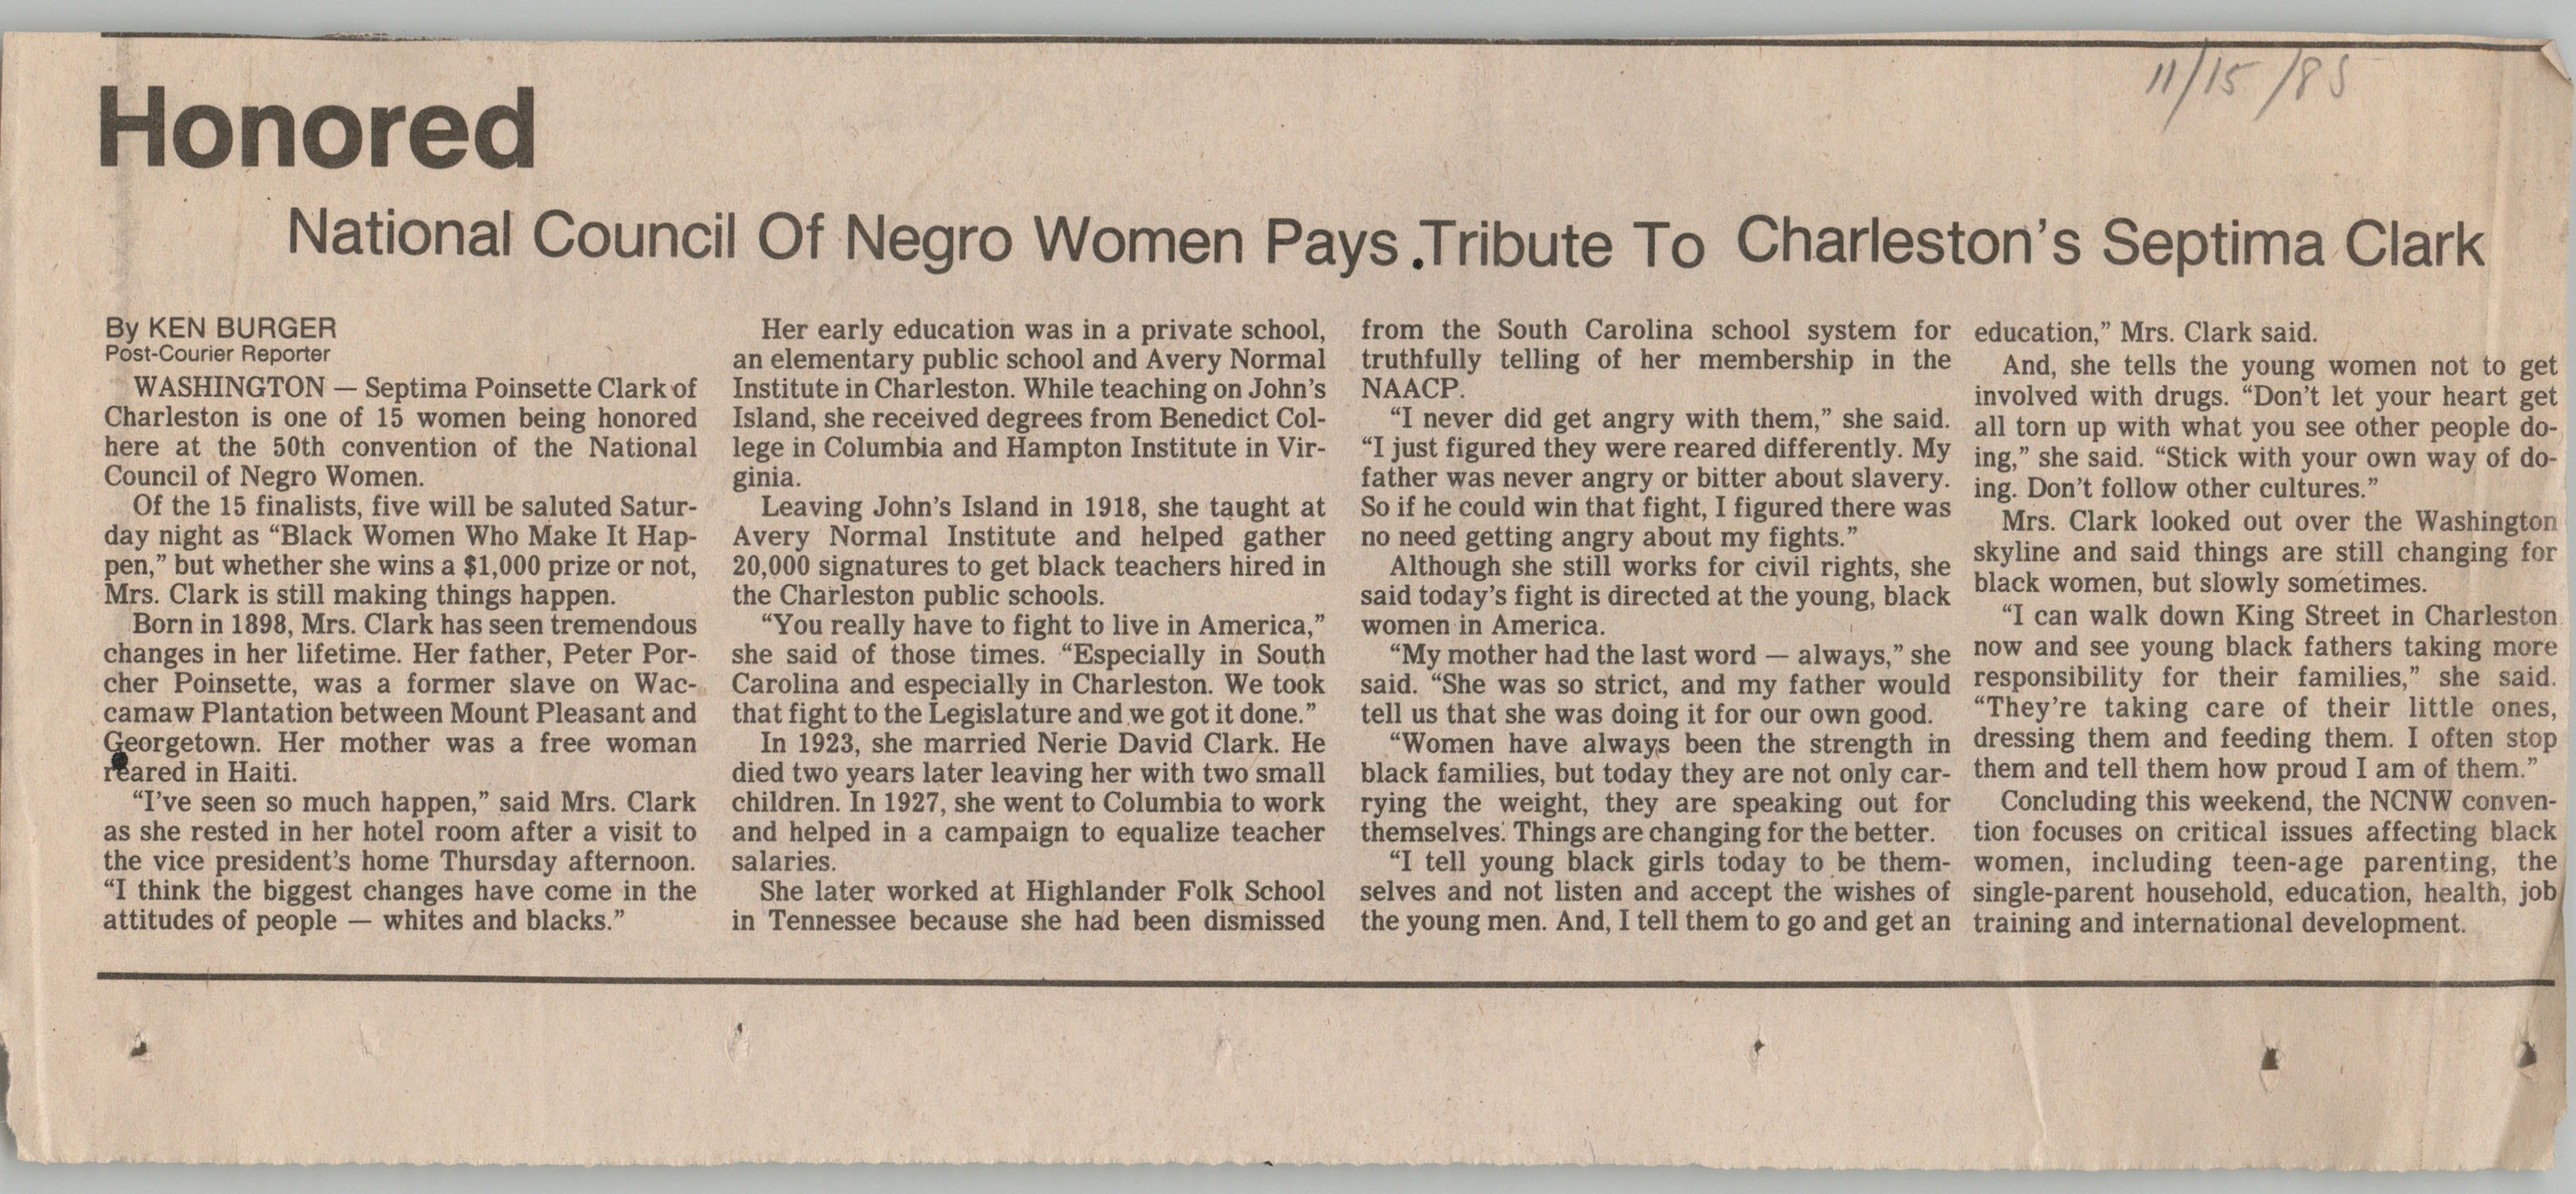 Newspaper Article, November 15, 1985